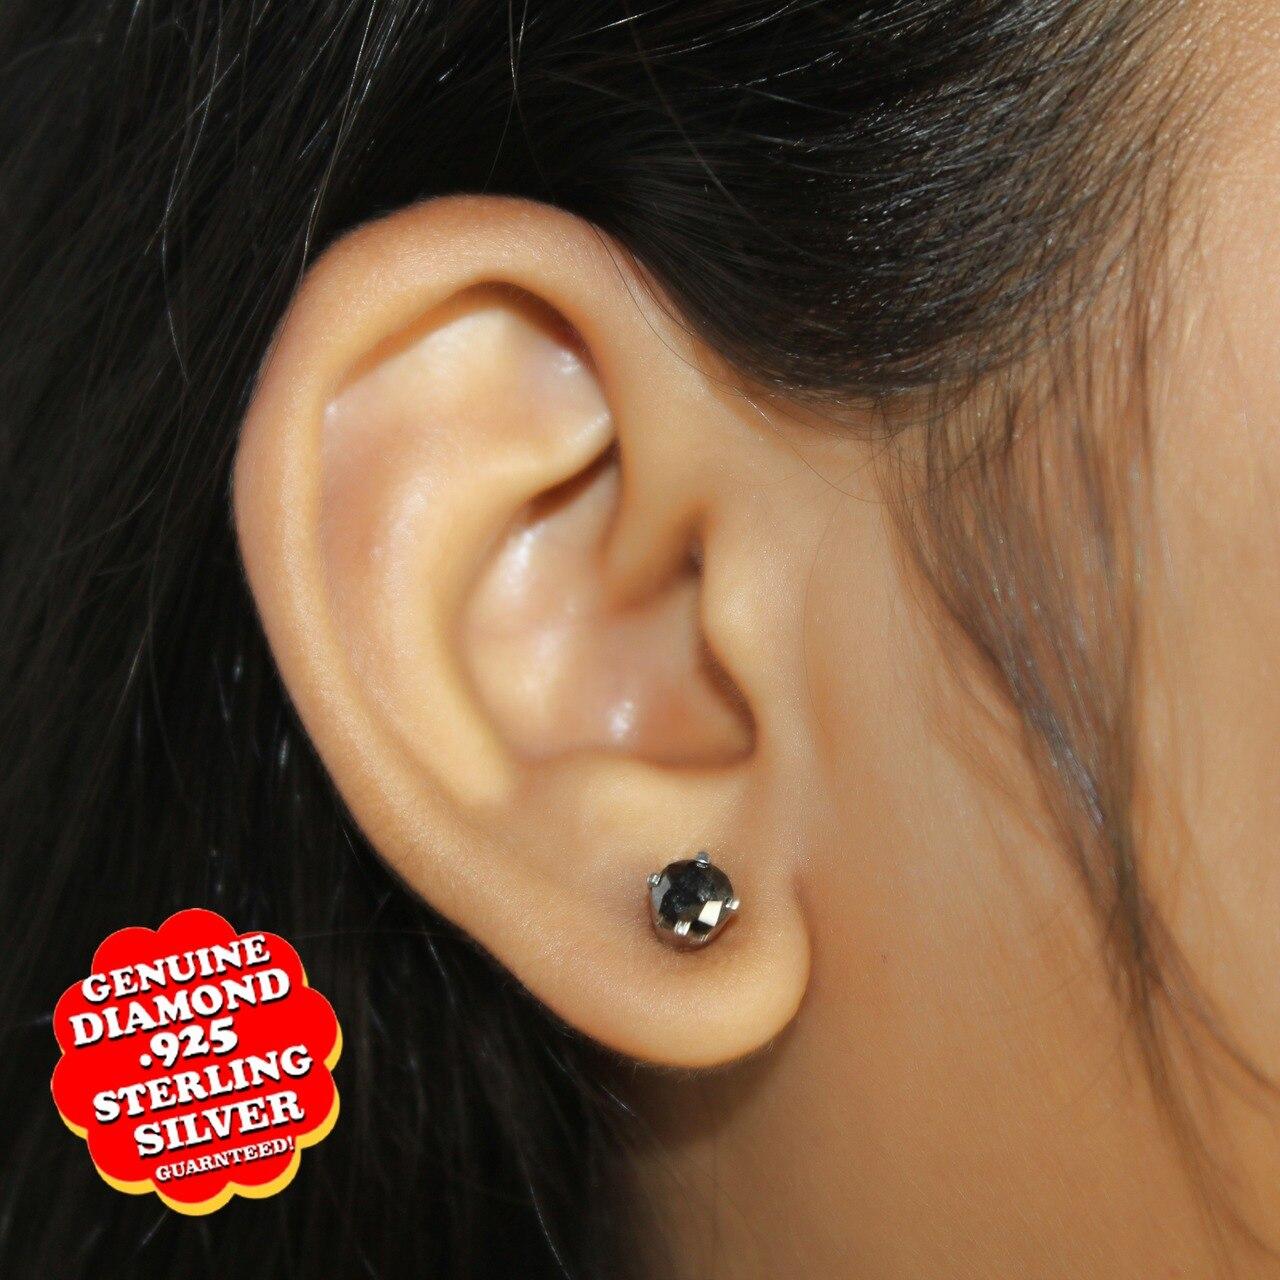 1.20 Ct Round Cut Black Genuine Moissanite Diamond Sterling Silver Stud Earrings